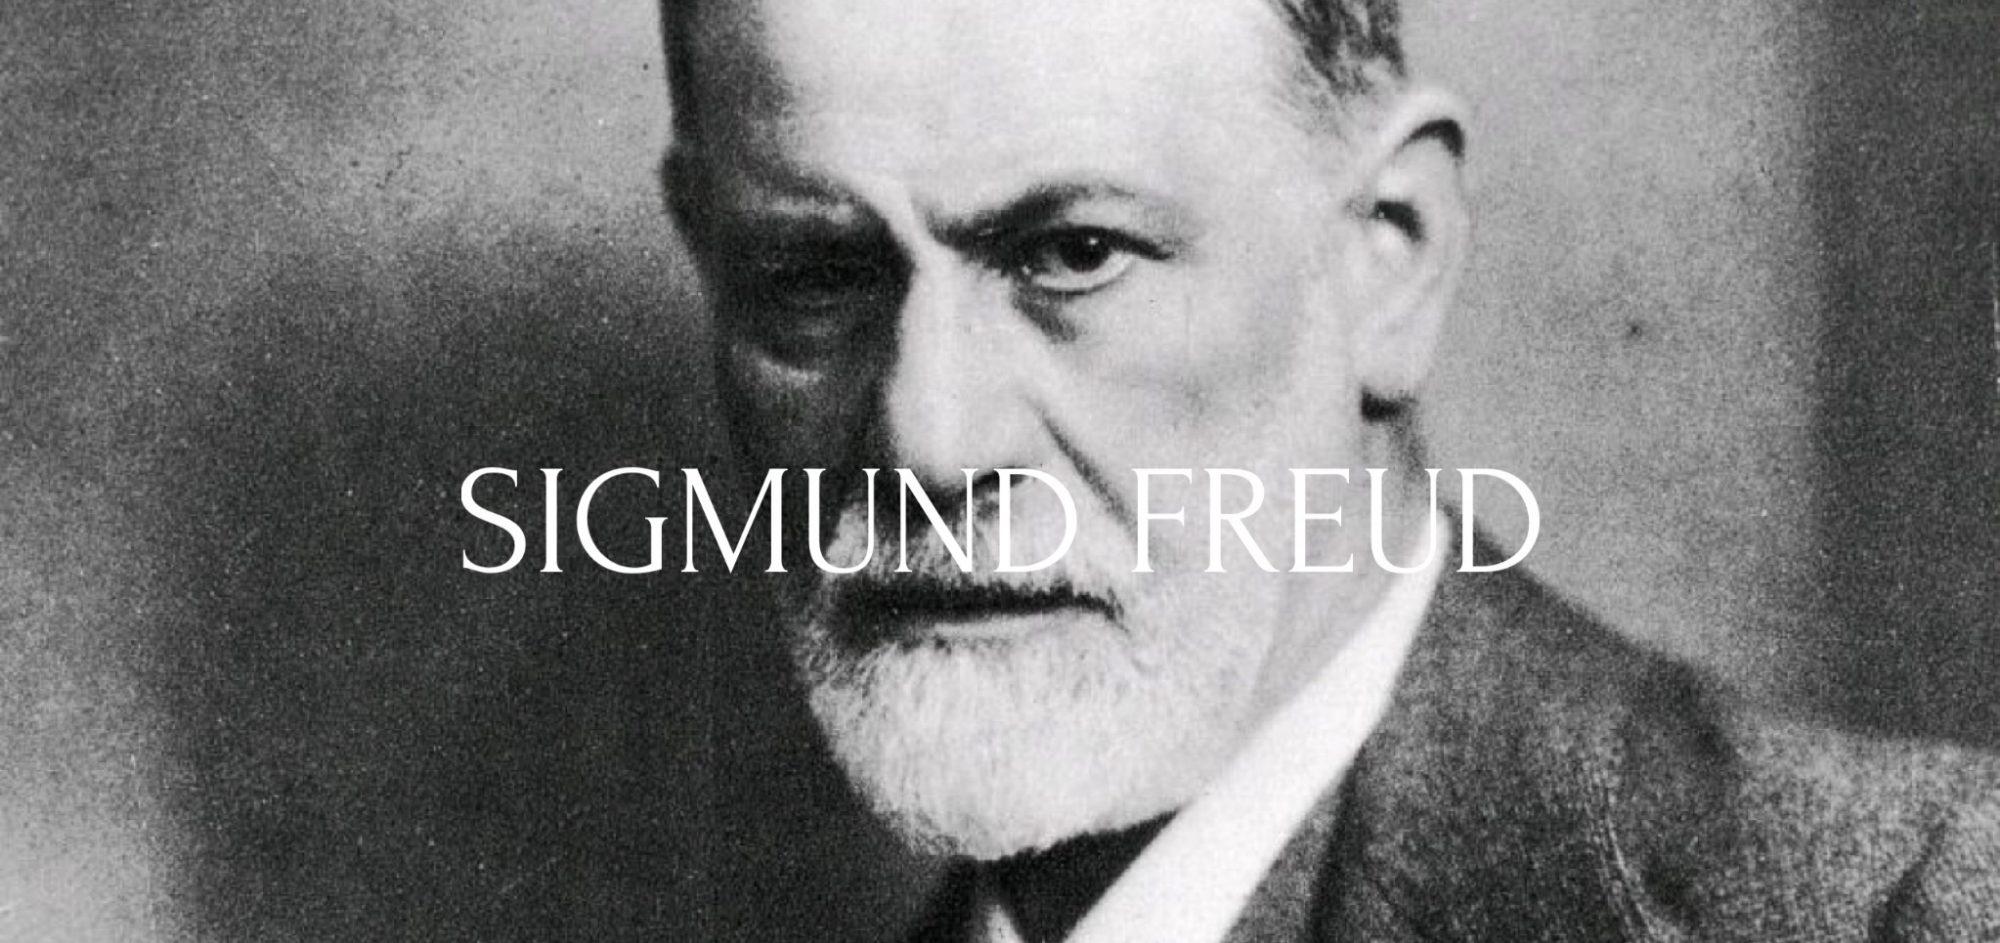 Qui est Sigmund Freud?